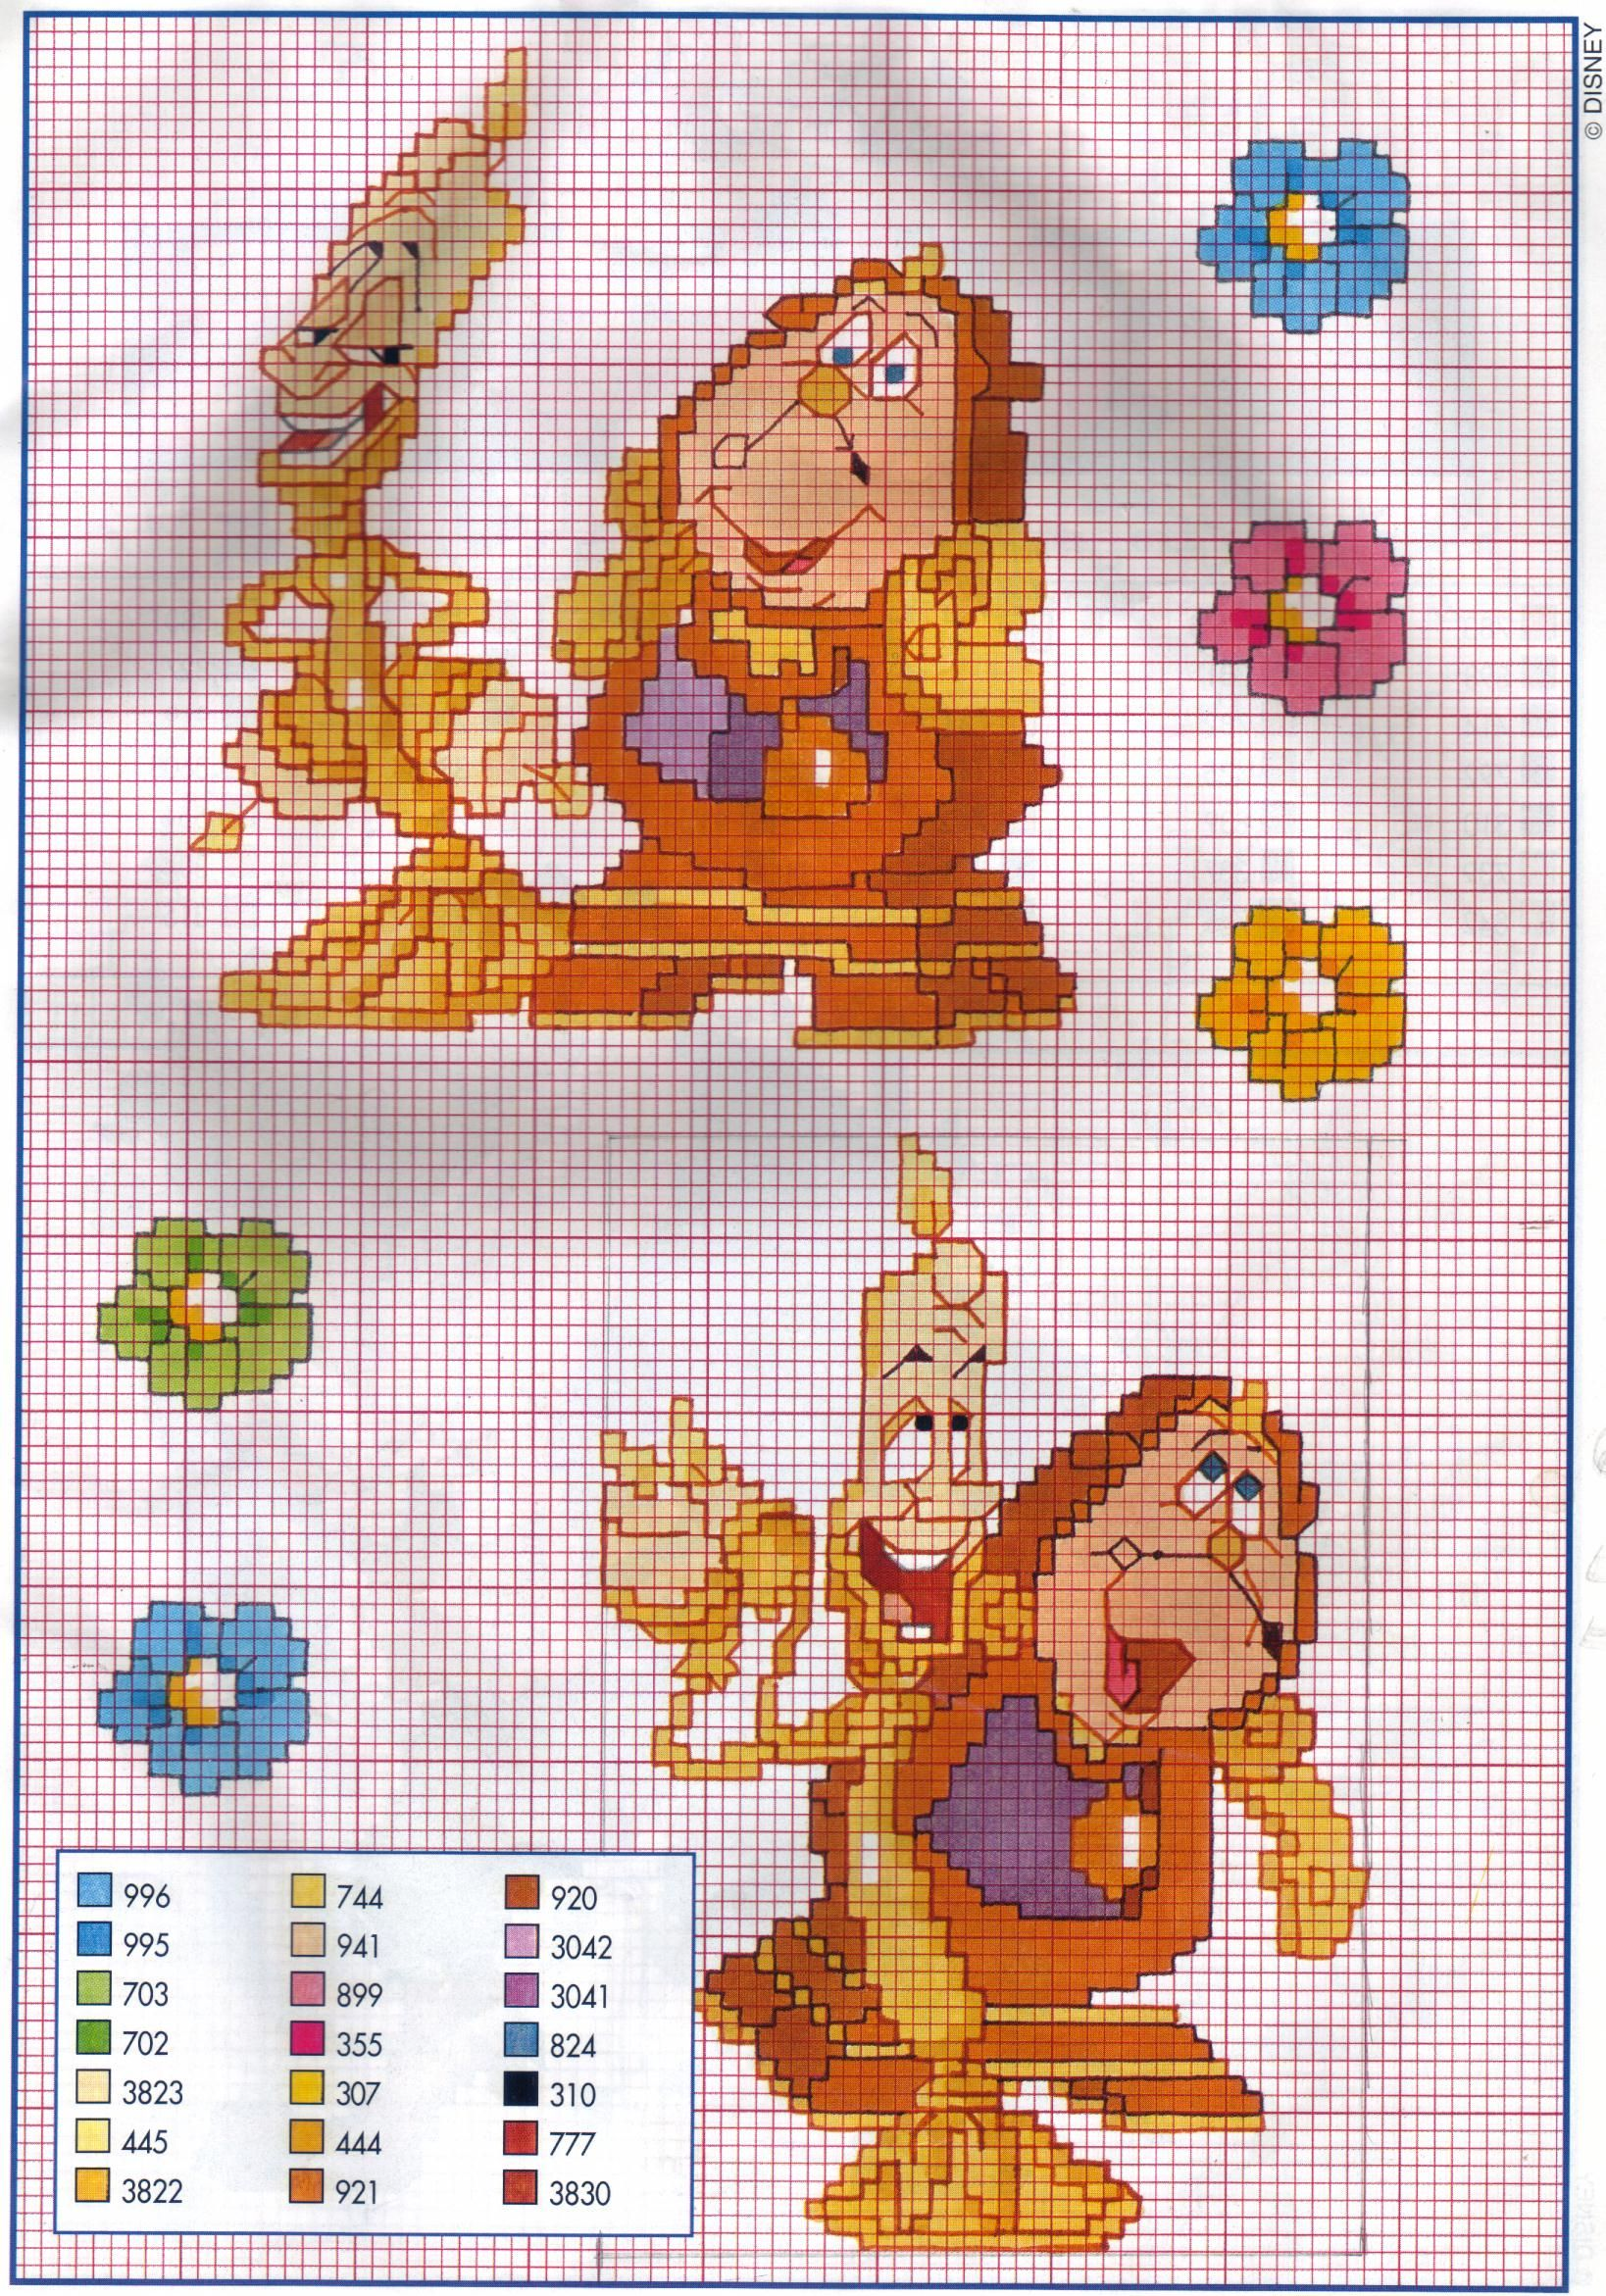 Schemi cartoni animati 132 schemi punto croce gratuiti for Disney punto croce schemi gratis